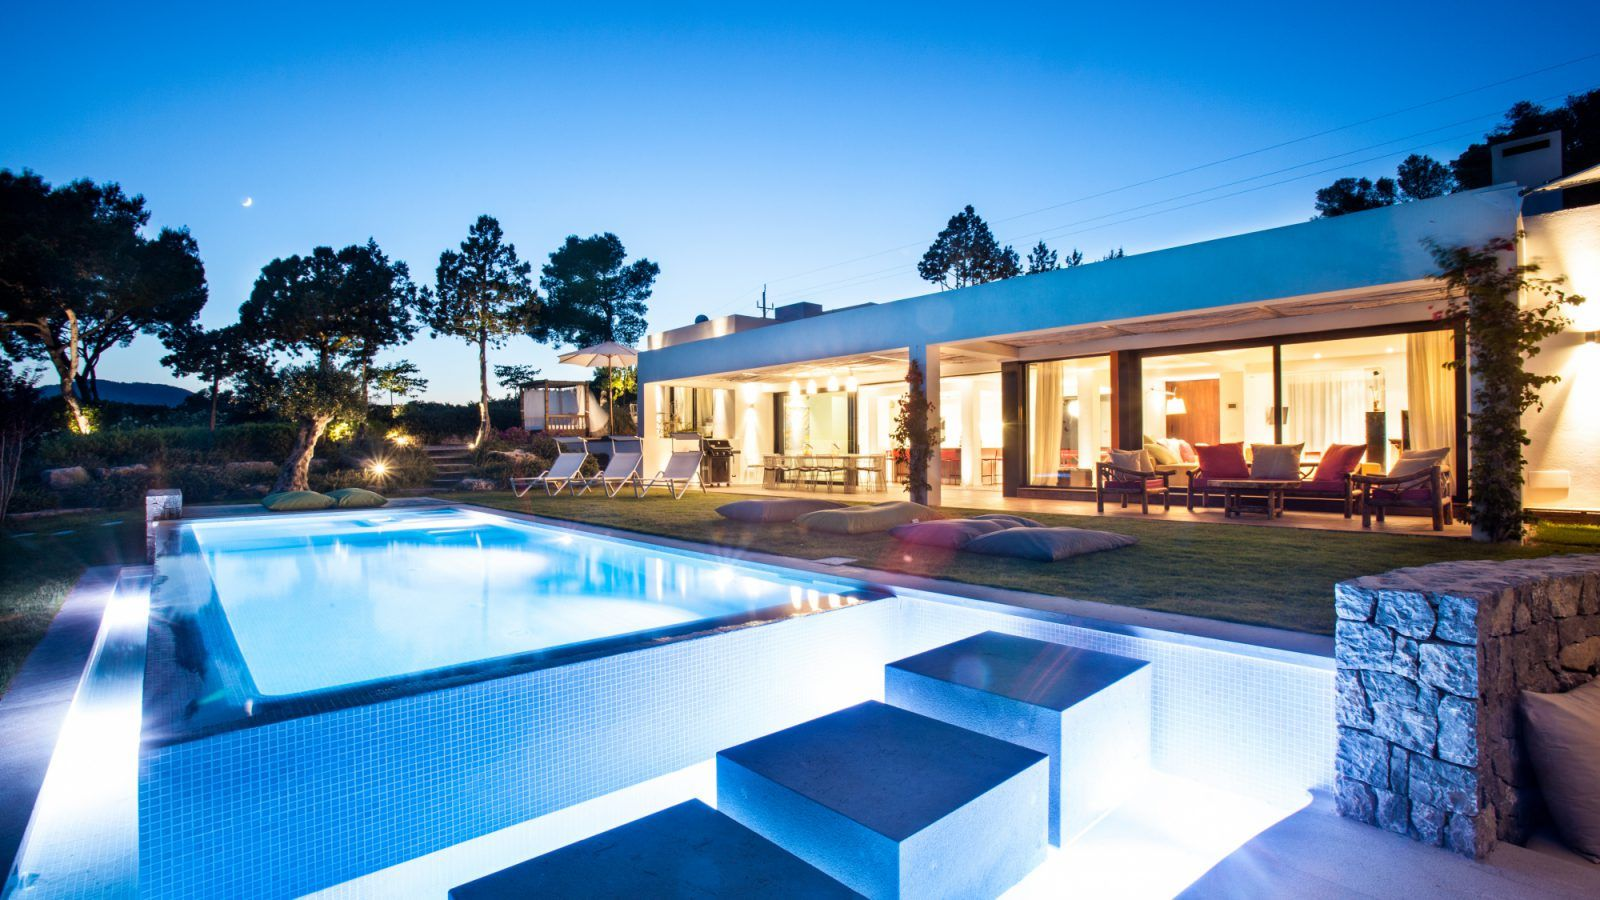 Luxury Villa For Rent In Ibiza Close Cala Jondal In The Best Area Of The Island Luxury Villa Luxury Estate Villa